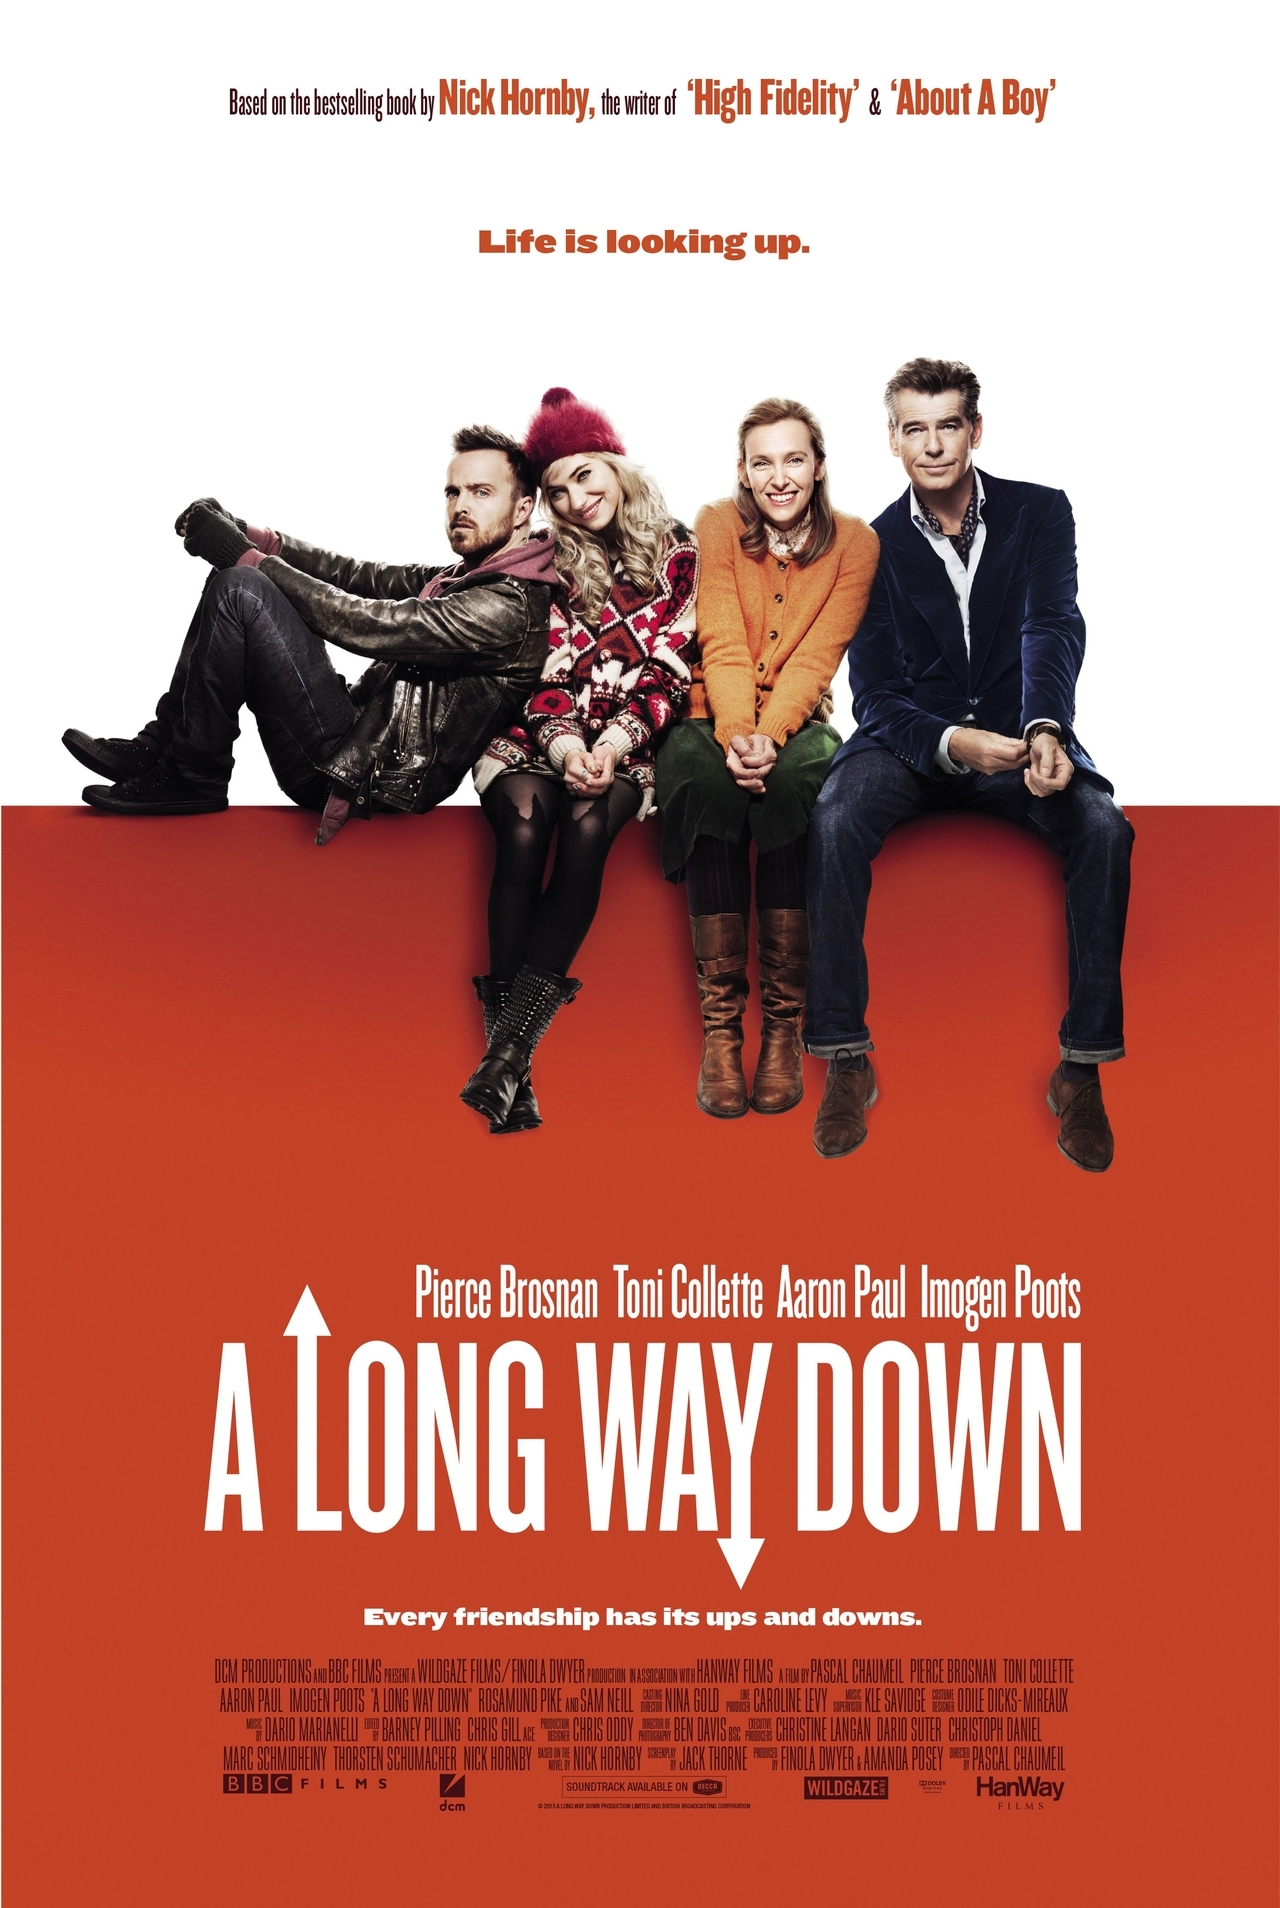 http://media.kg-portal.ru/movies/l/longwaydown/posters/longwaydown_1.jpg